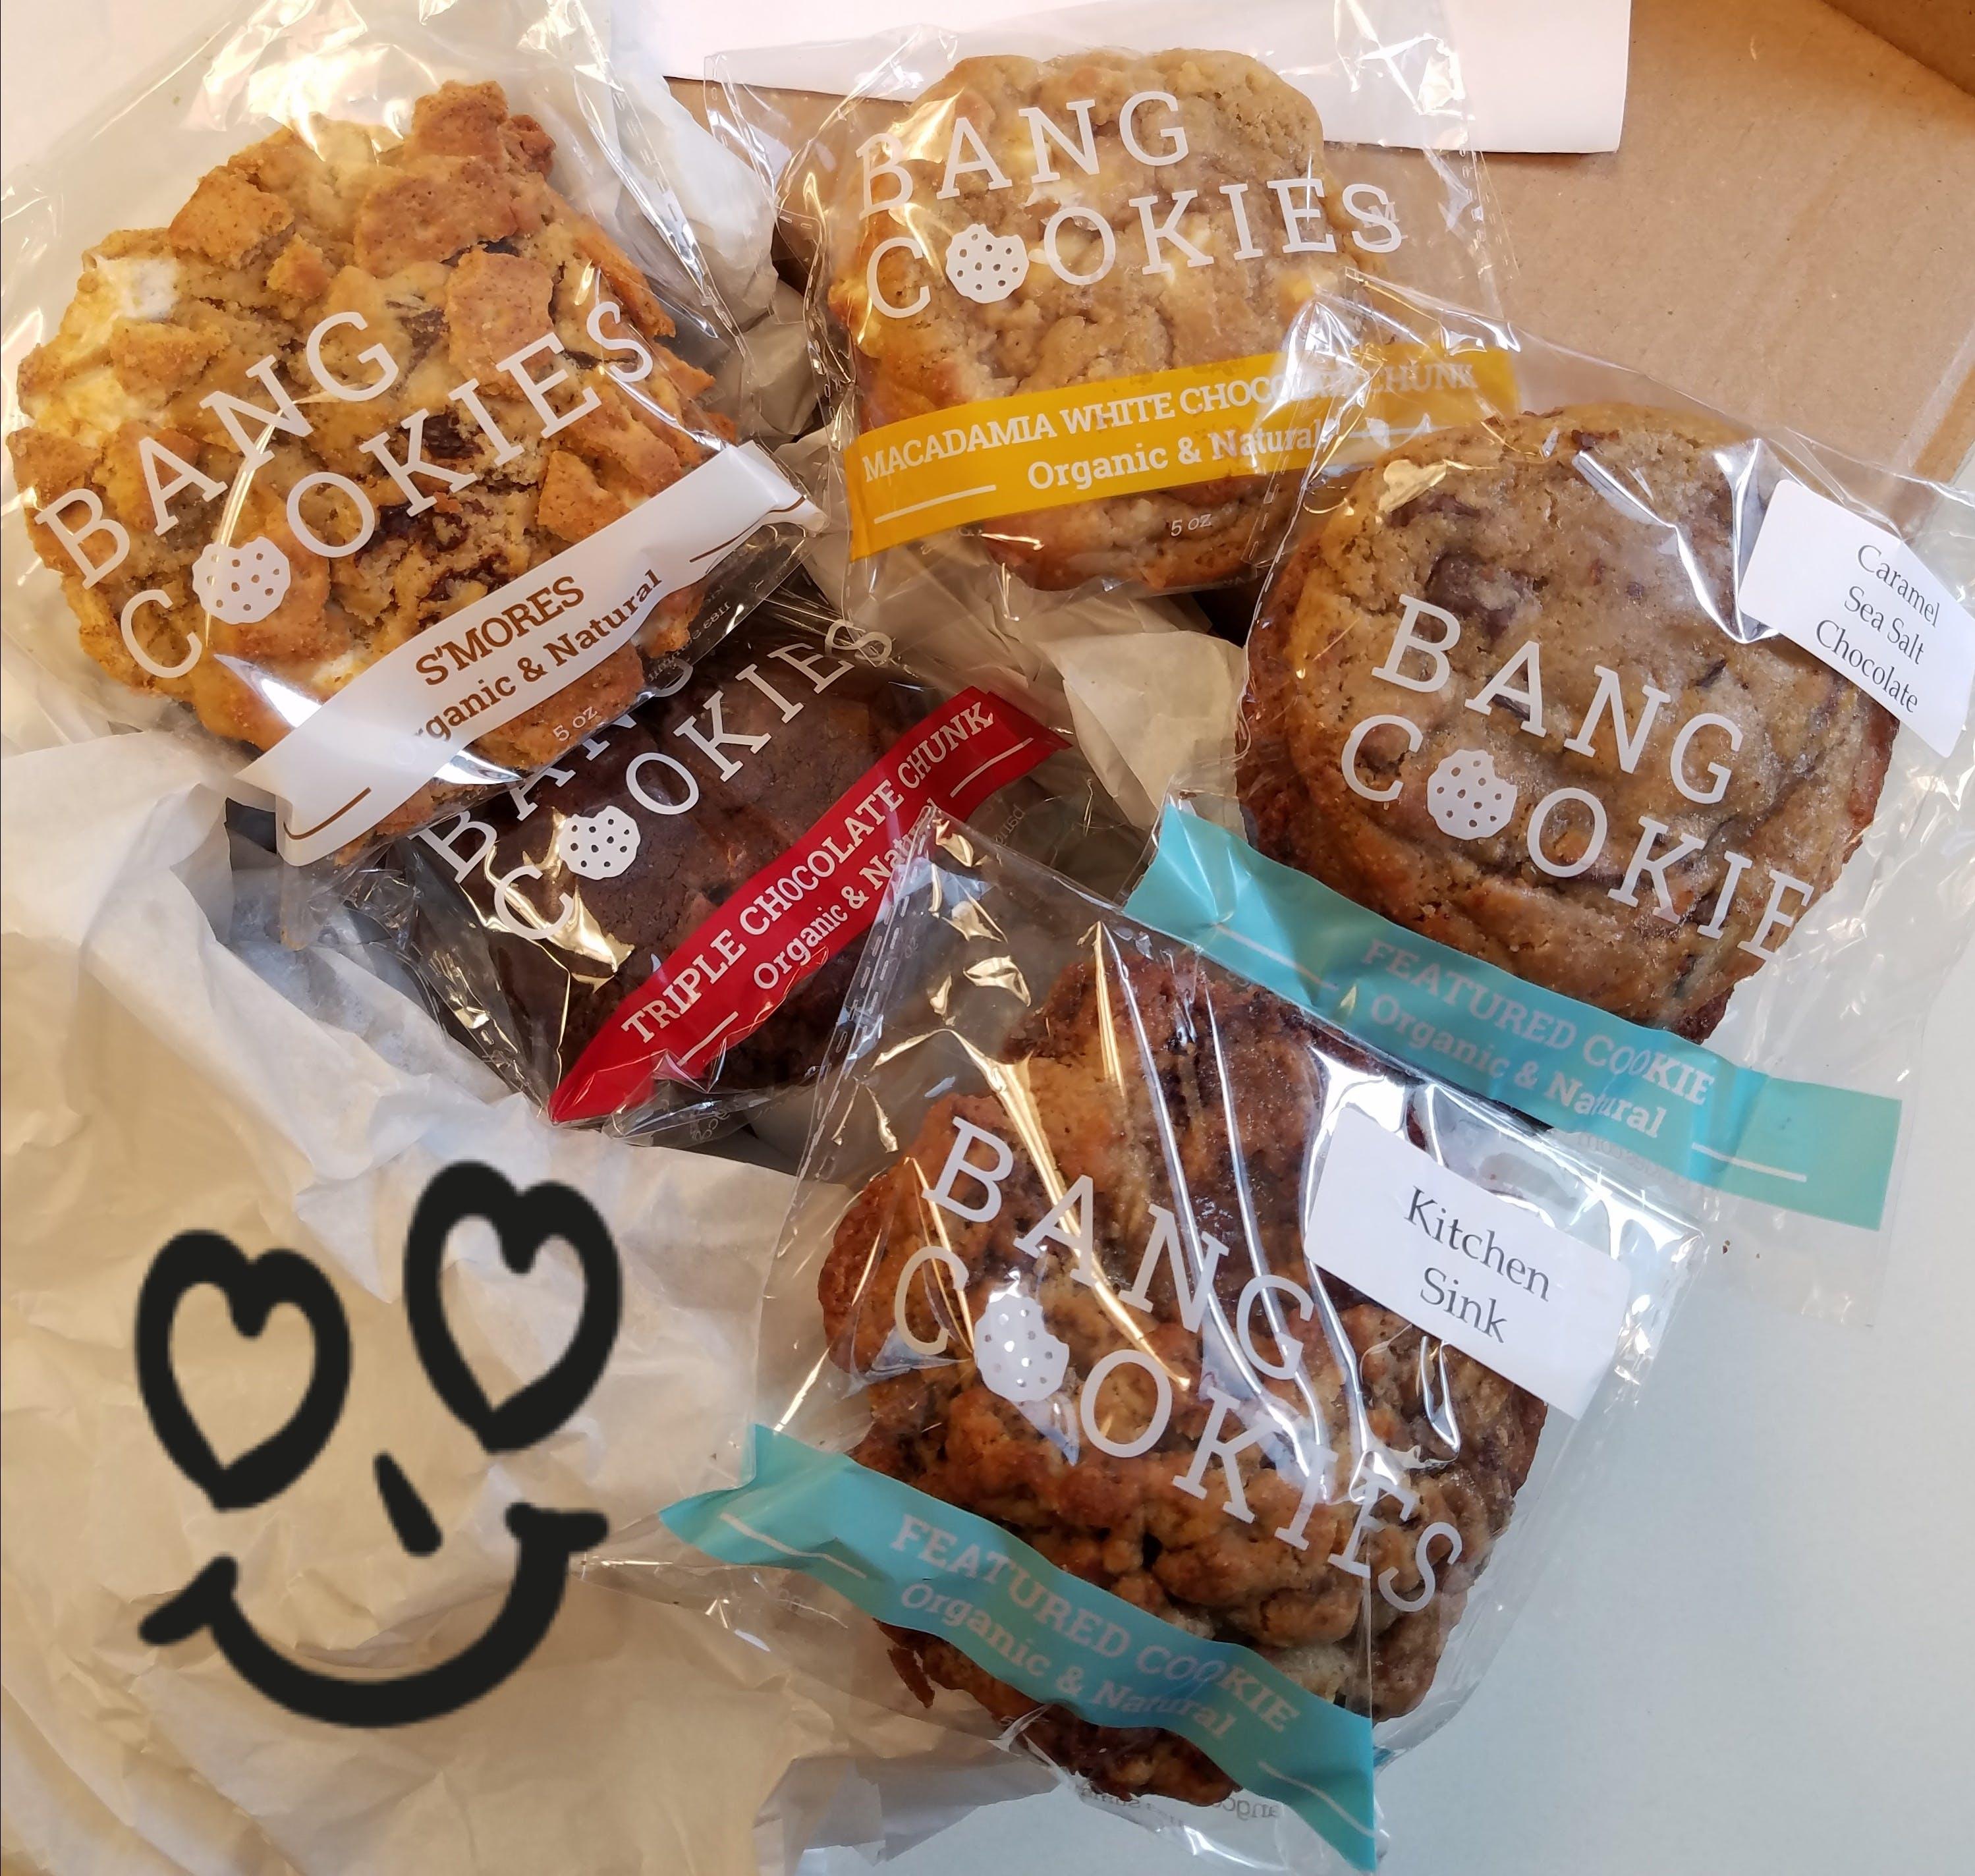 Kitchen Sink – Bang Cookies